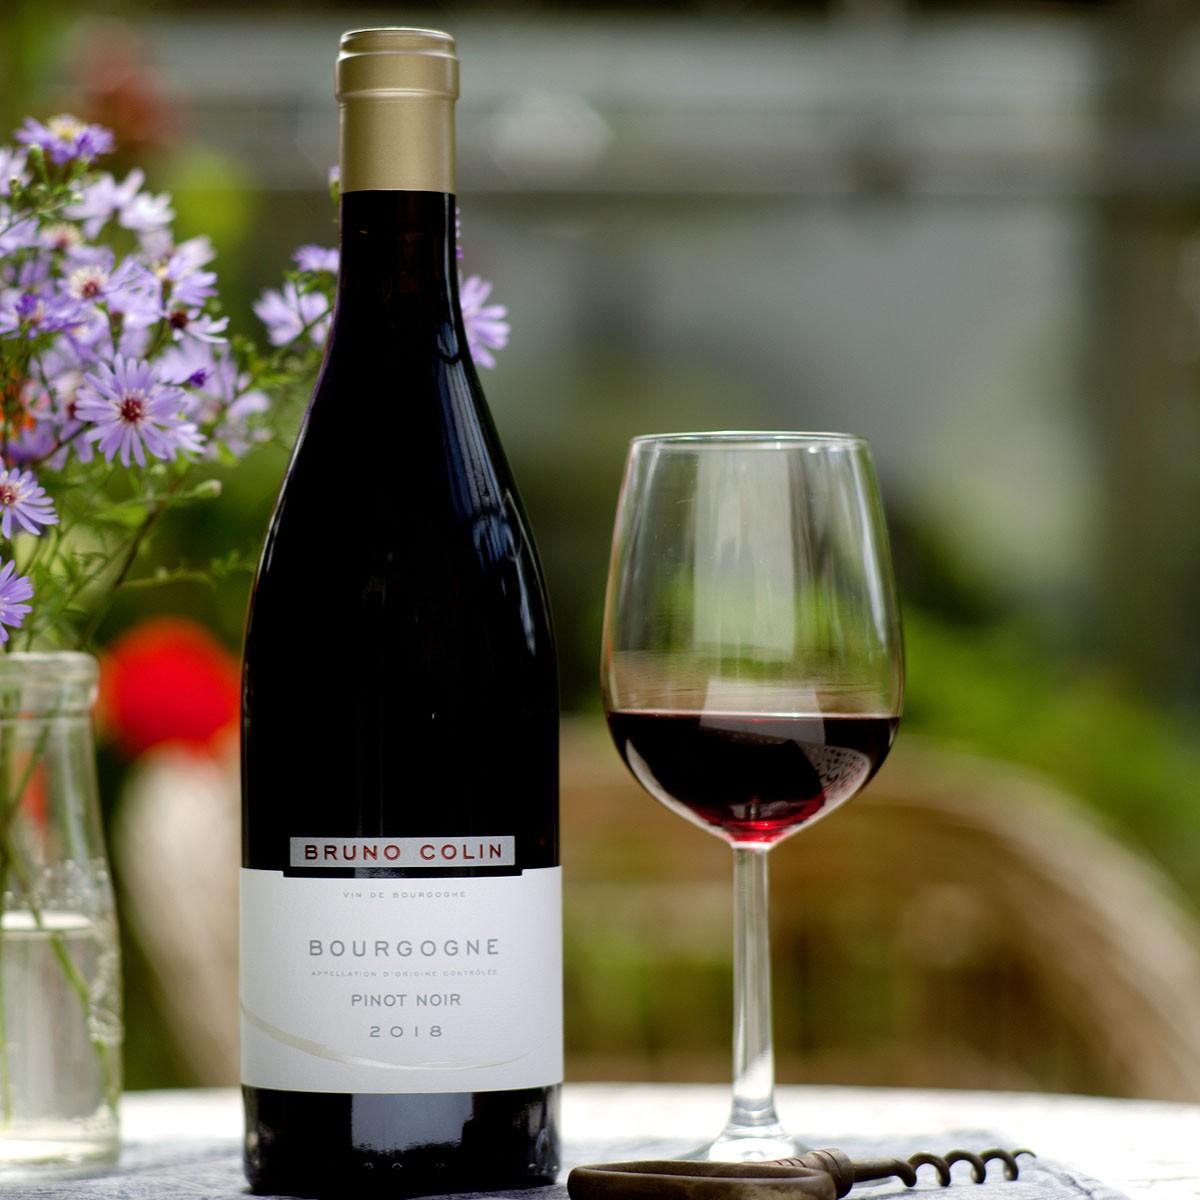 Bourgogne Pinot Noir: Domaine Bruno Colin 2018 - Lifestyle